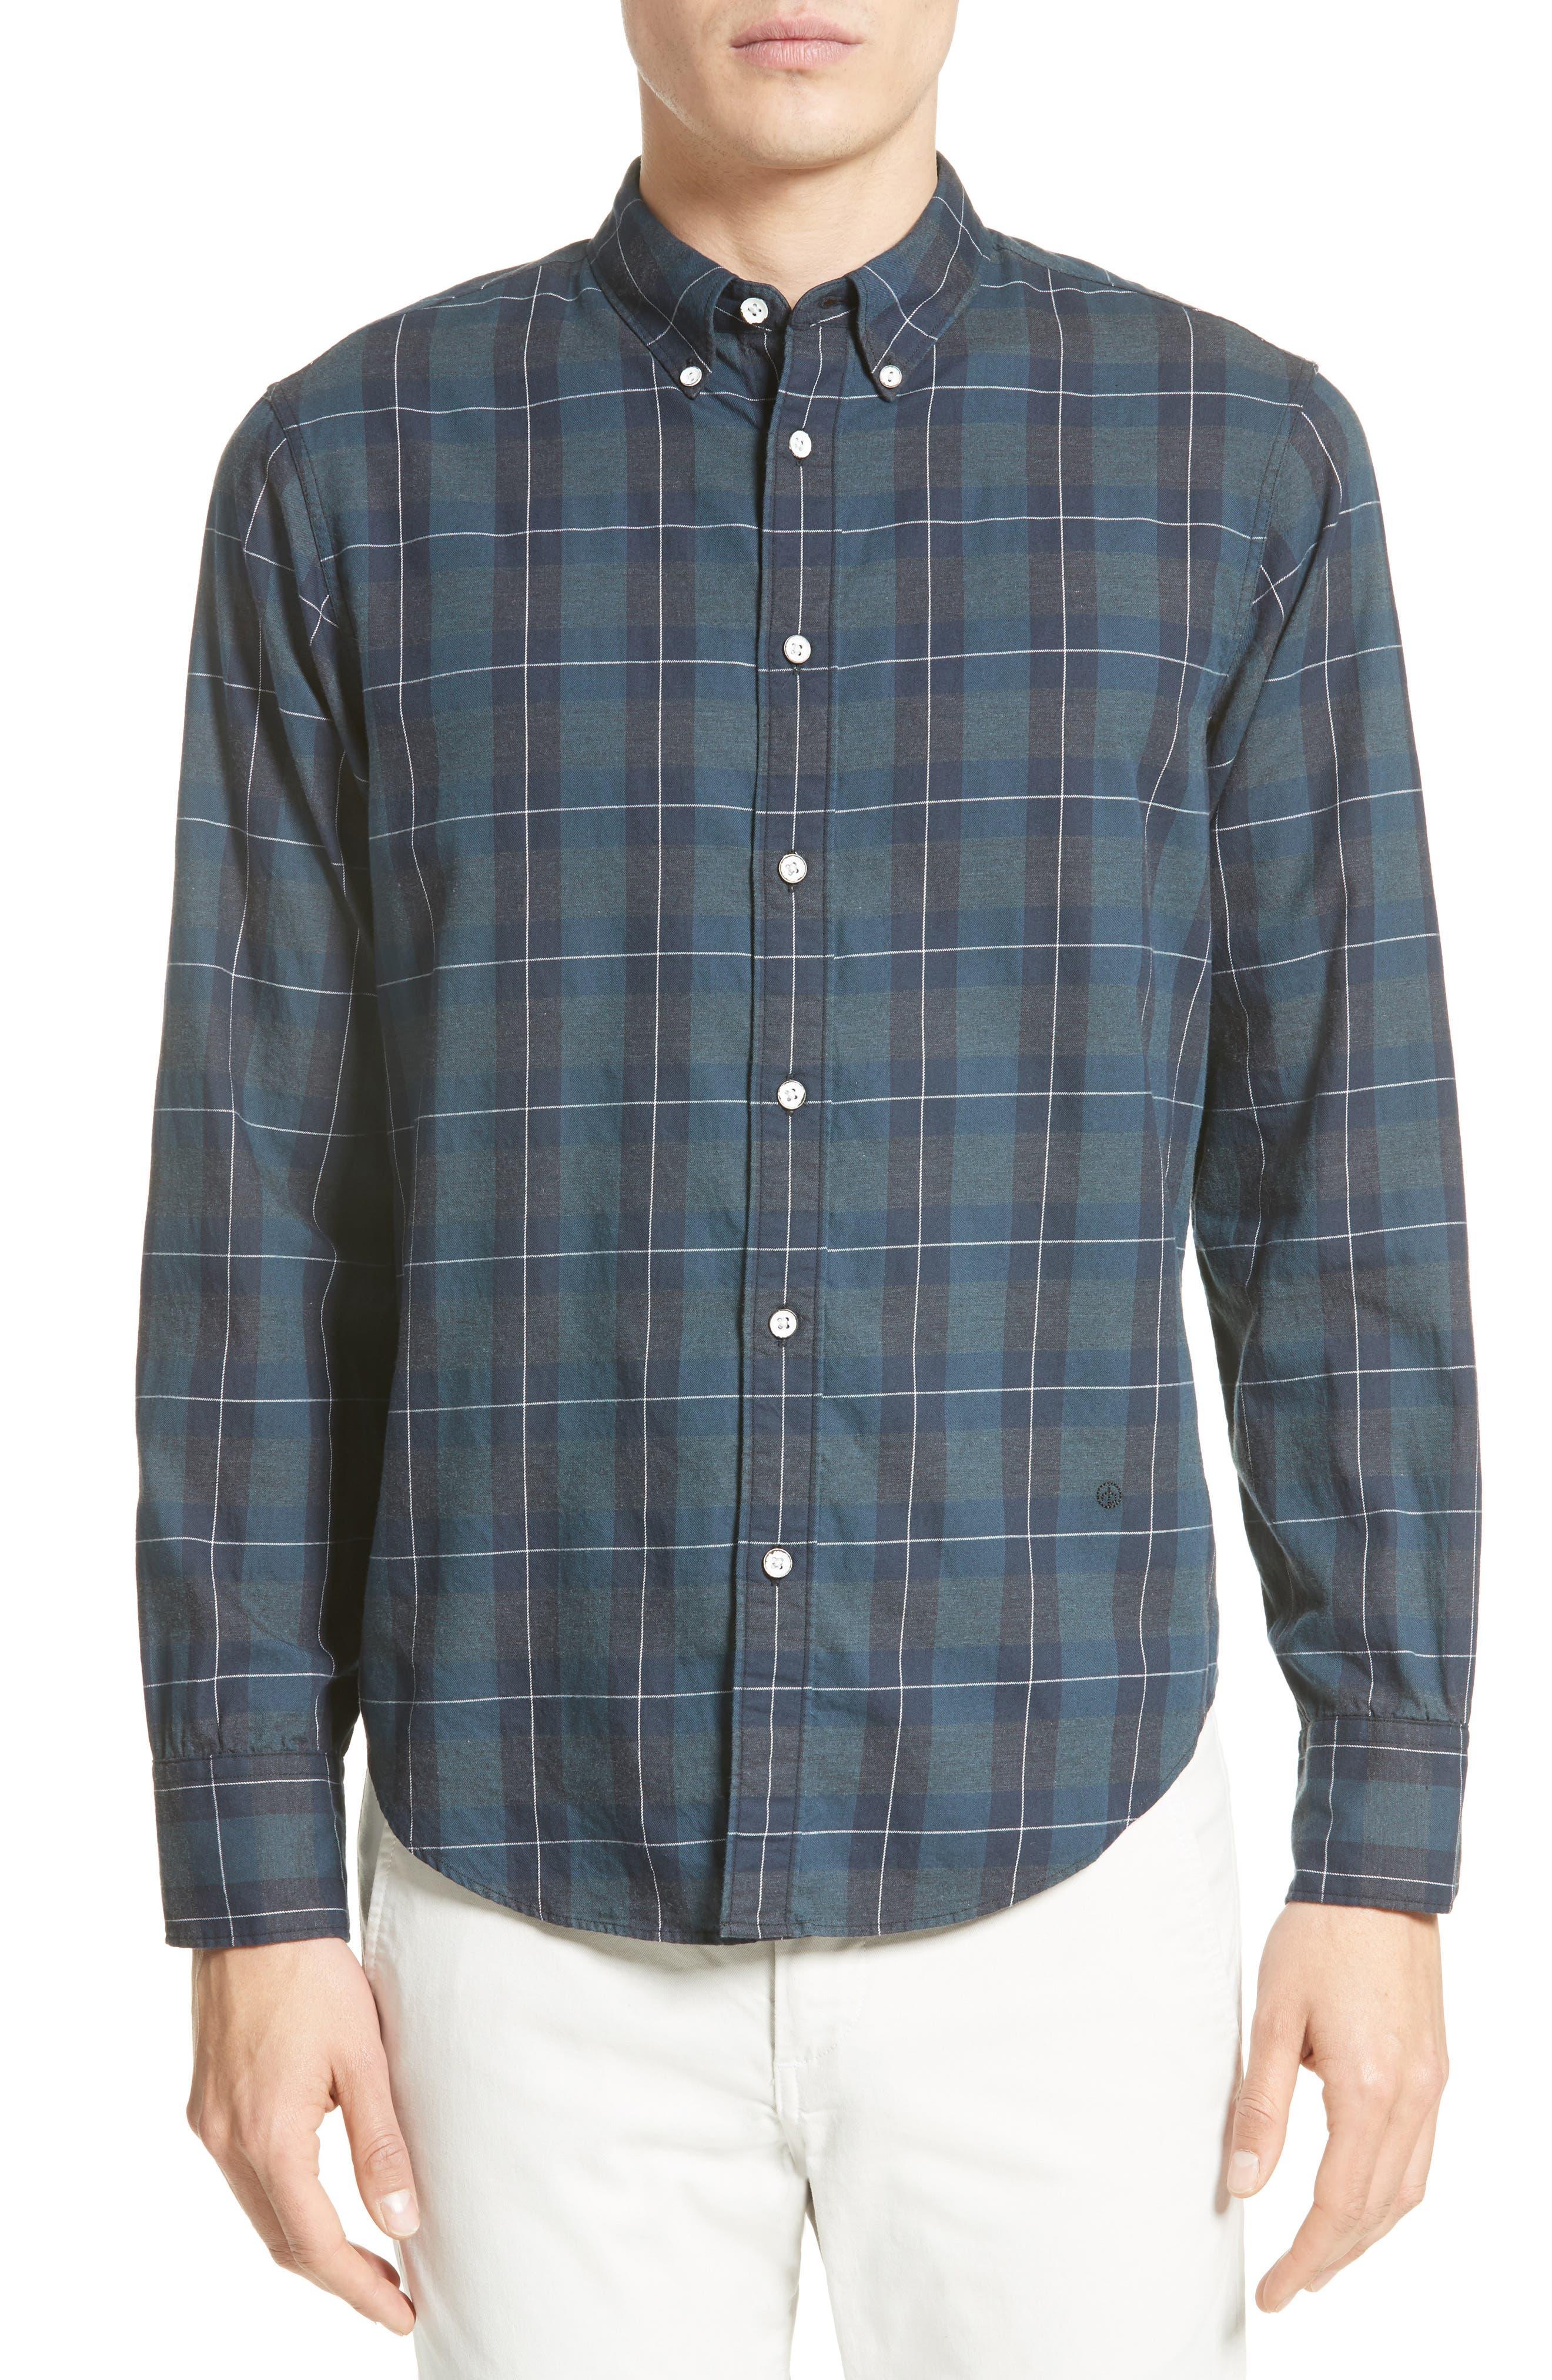 Tomlin Plaid Sport Shirt,                         Main,                         color, 462